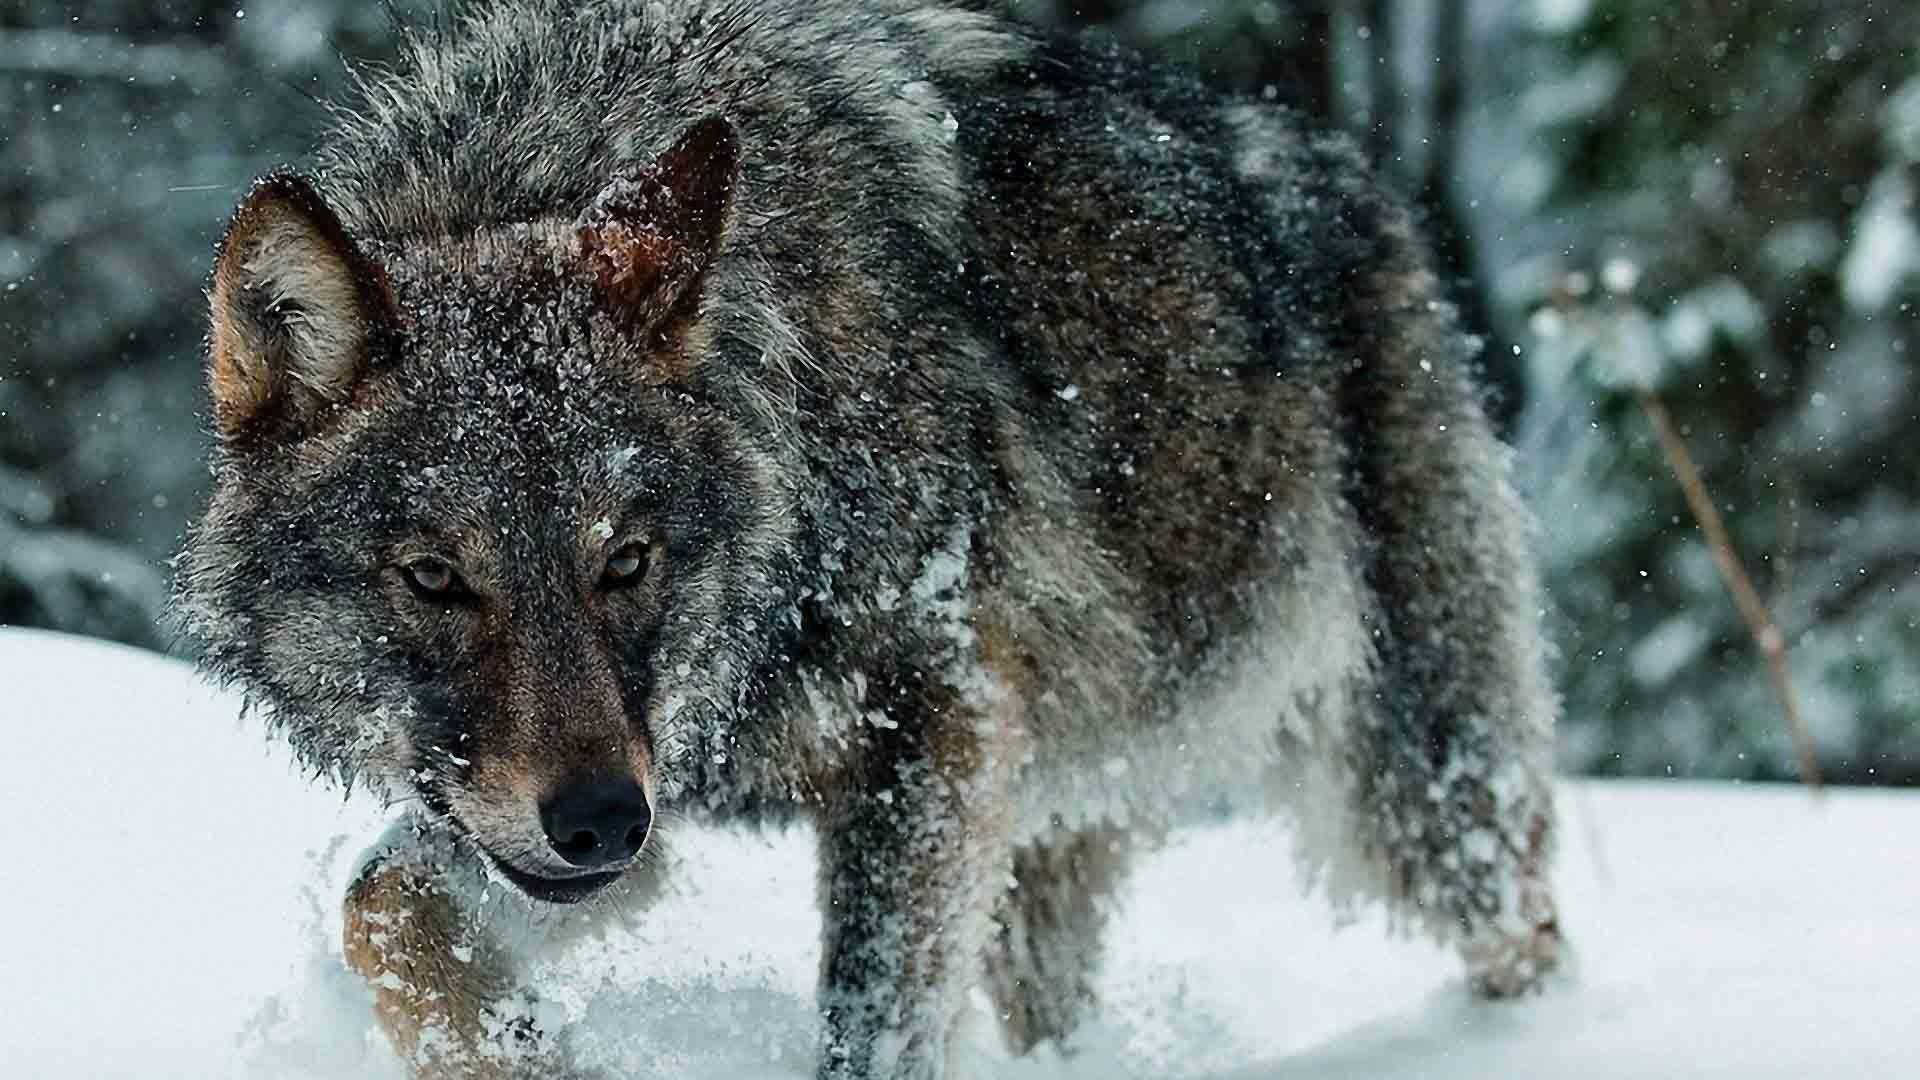 Top Wallpaper Macbook Wolf - 932193-vertical-timber-wolf-wallpaper-1920x1080-ipad-pro  Pictures_934765.jpg